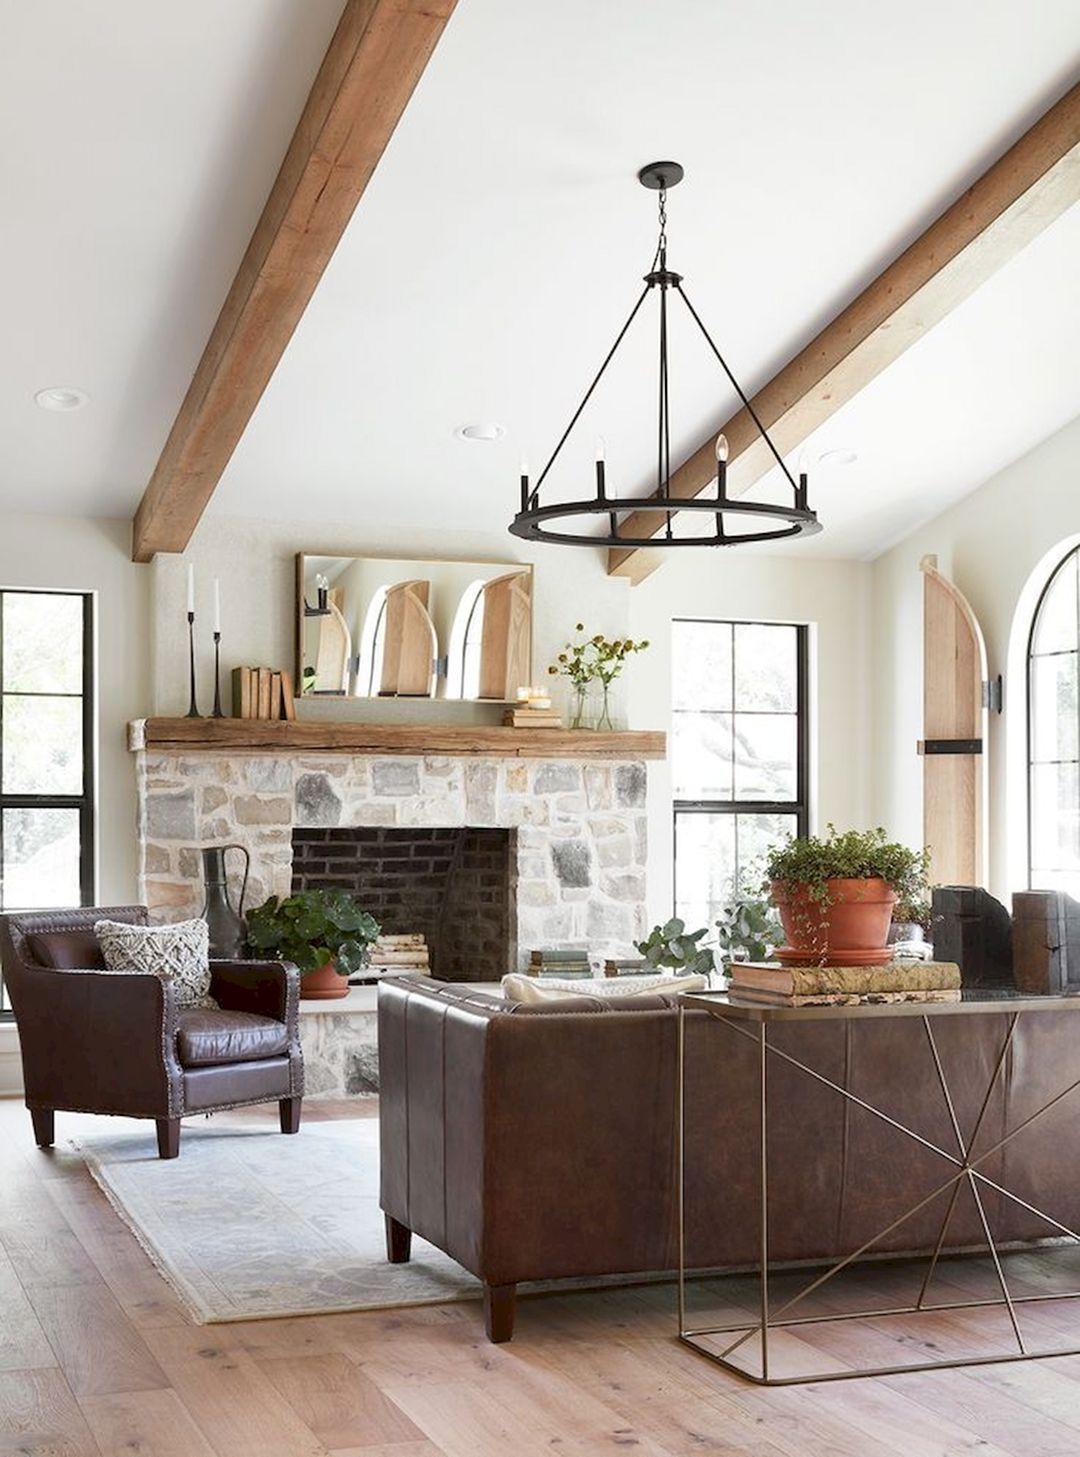 Outstanding Amazing 25 Fixer Upper Aguilar House Interior Ideas Https Goodsgn